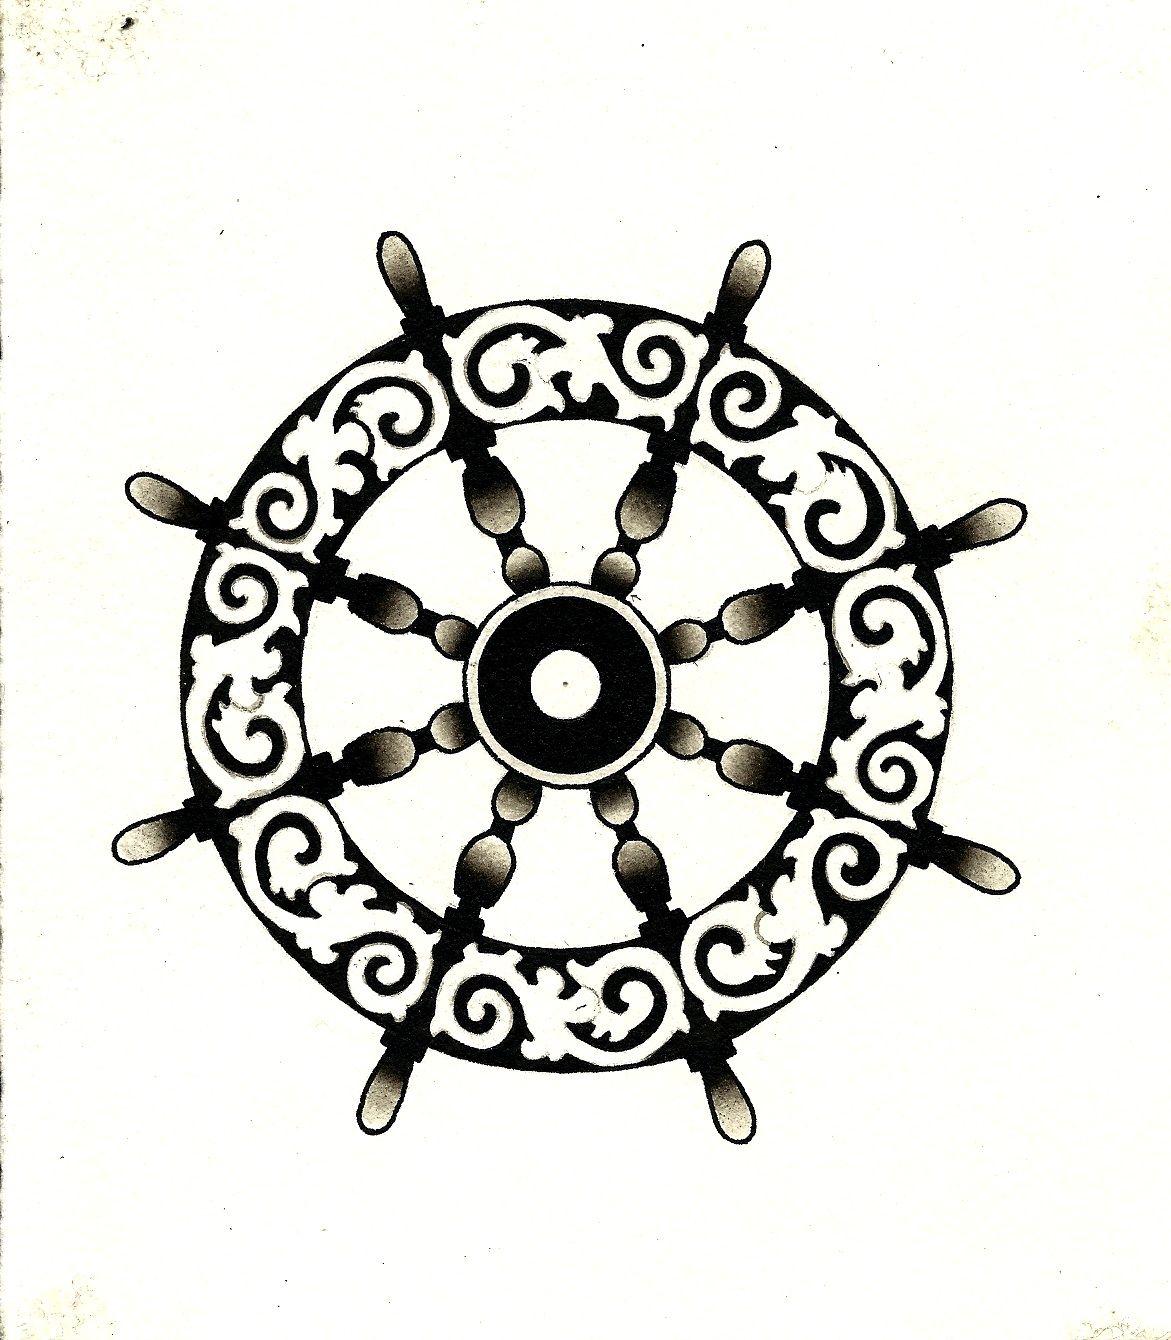 Ships Wheel Tattoo Google Search Tatuaggi Piercing